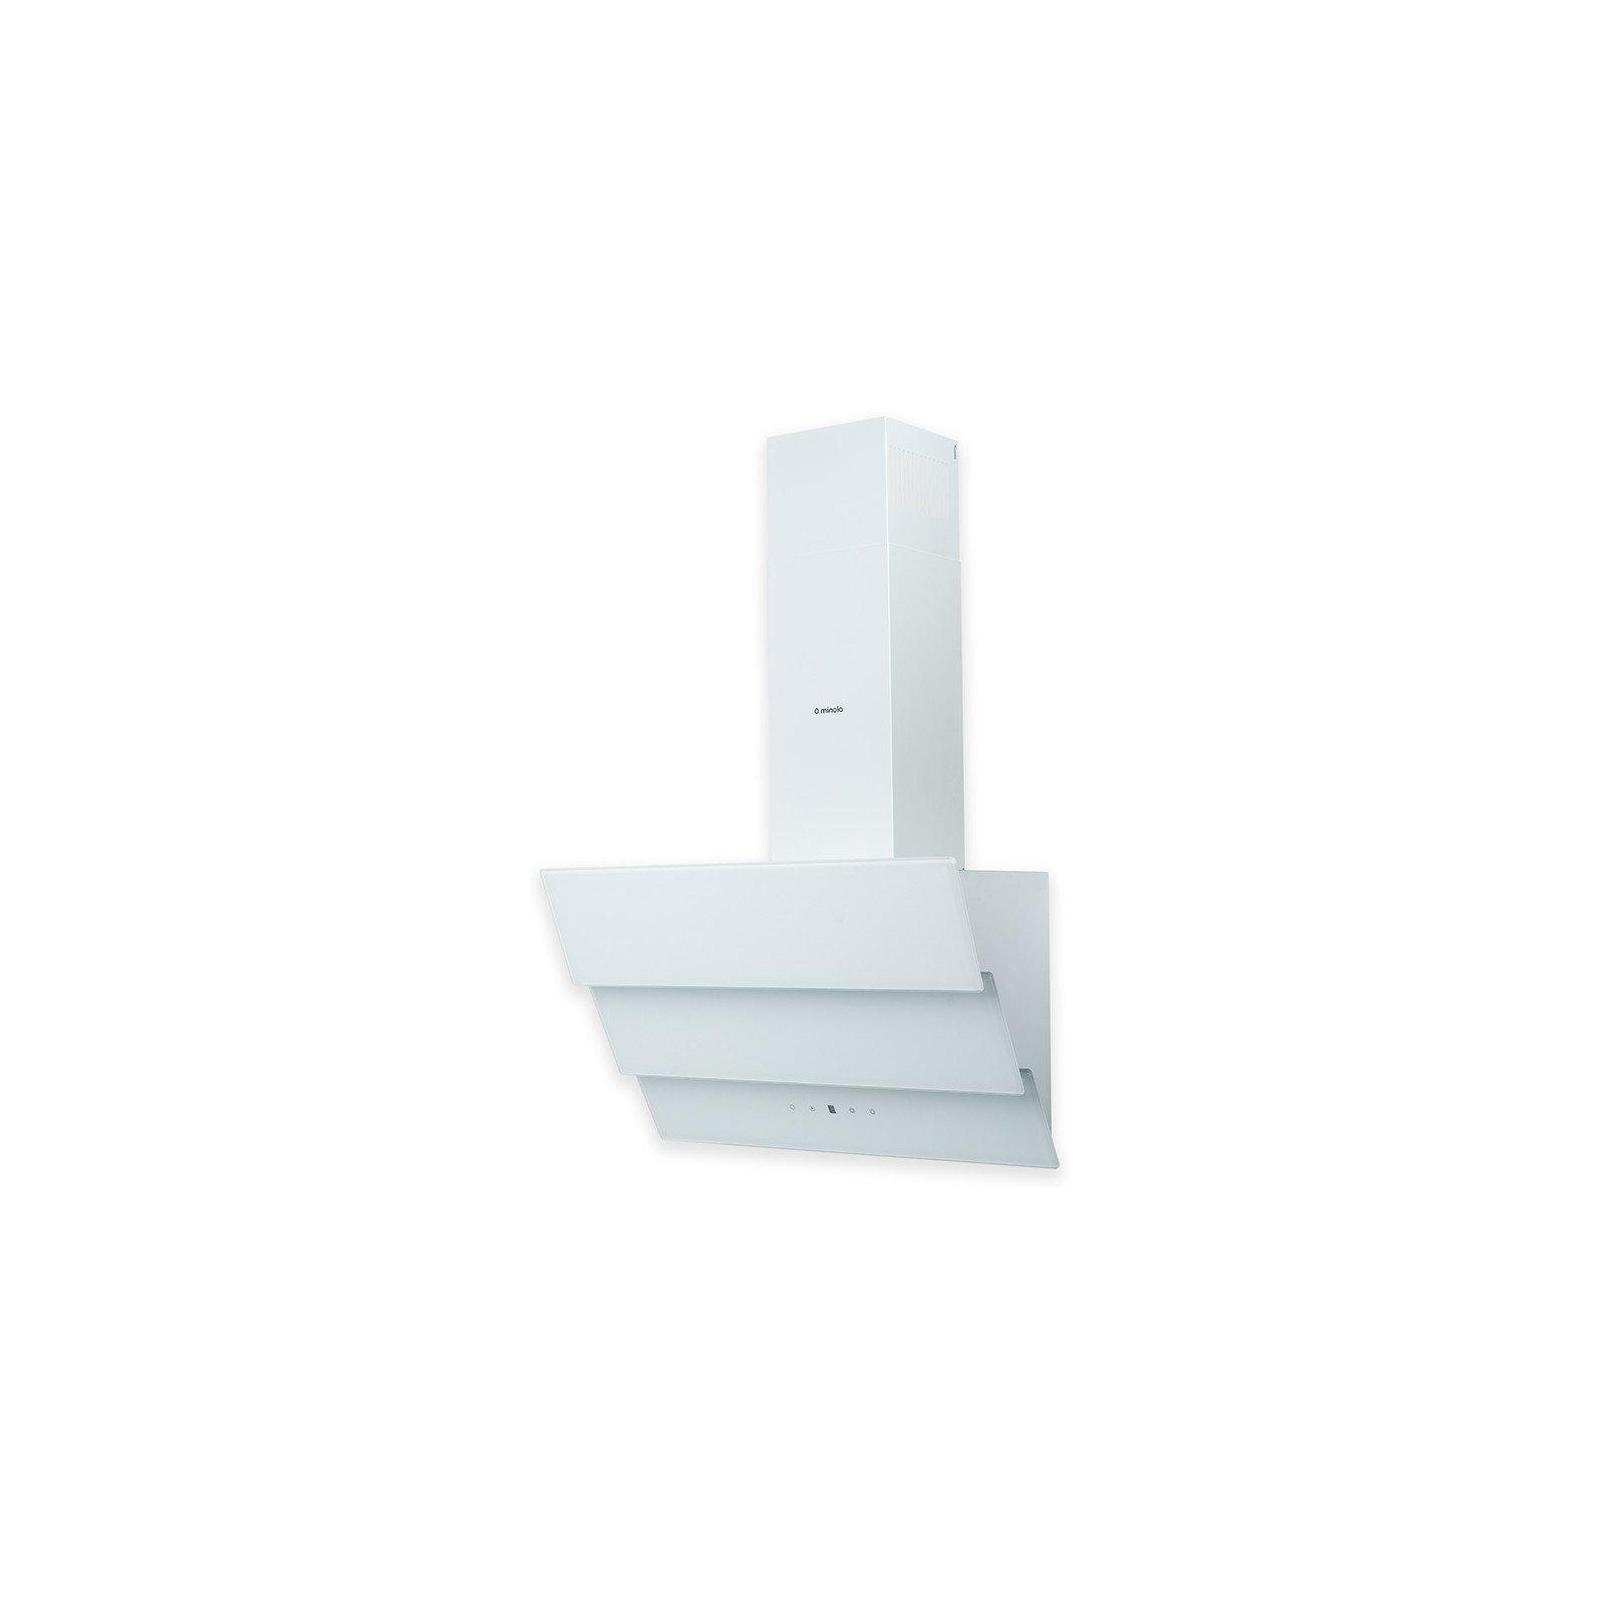 Вытяжка кухонная MINOLA HVS 6682 WH 1000 LED